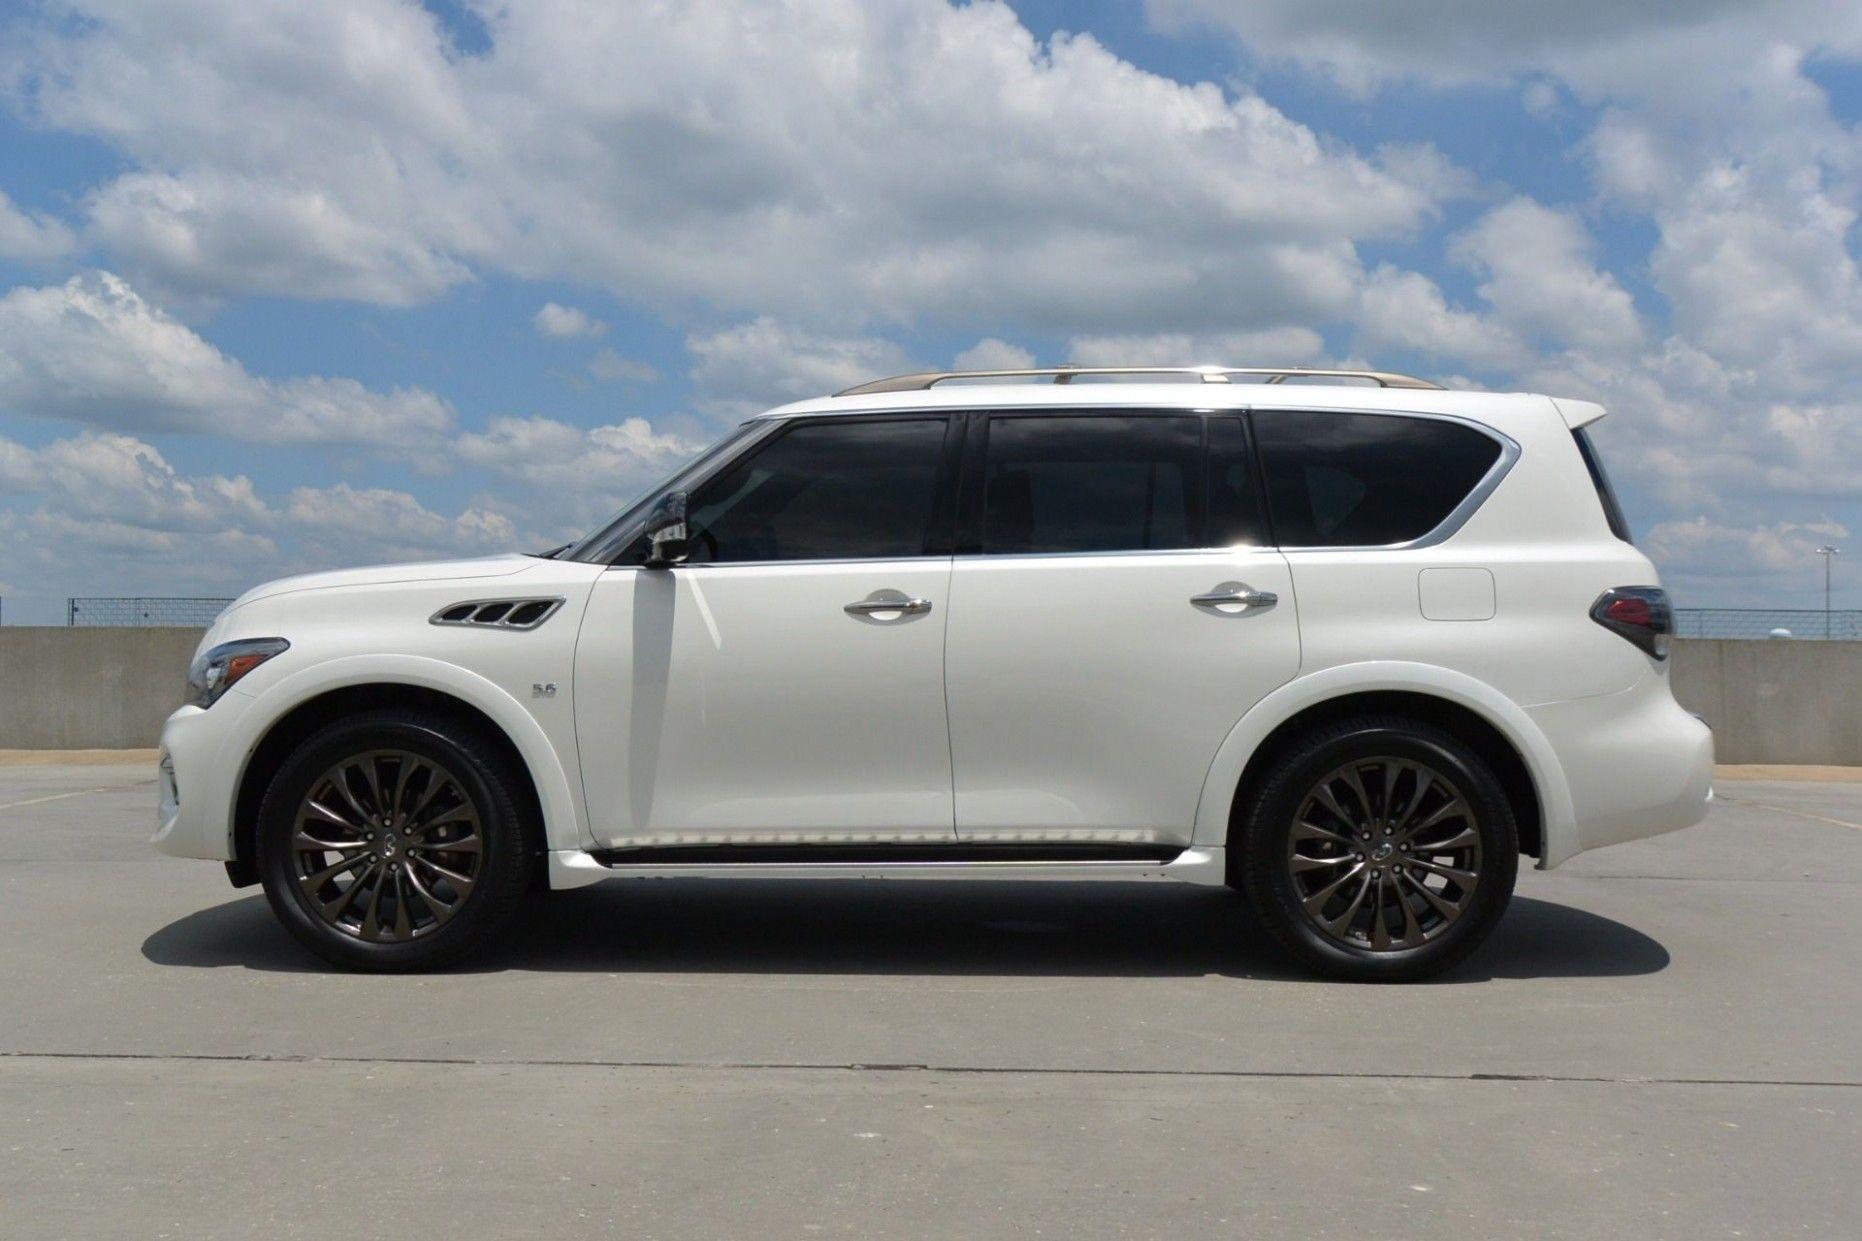 2021 Infiniti Qx80 Suv Exterior Suv Models Infinity Suv Lexus Suv